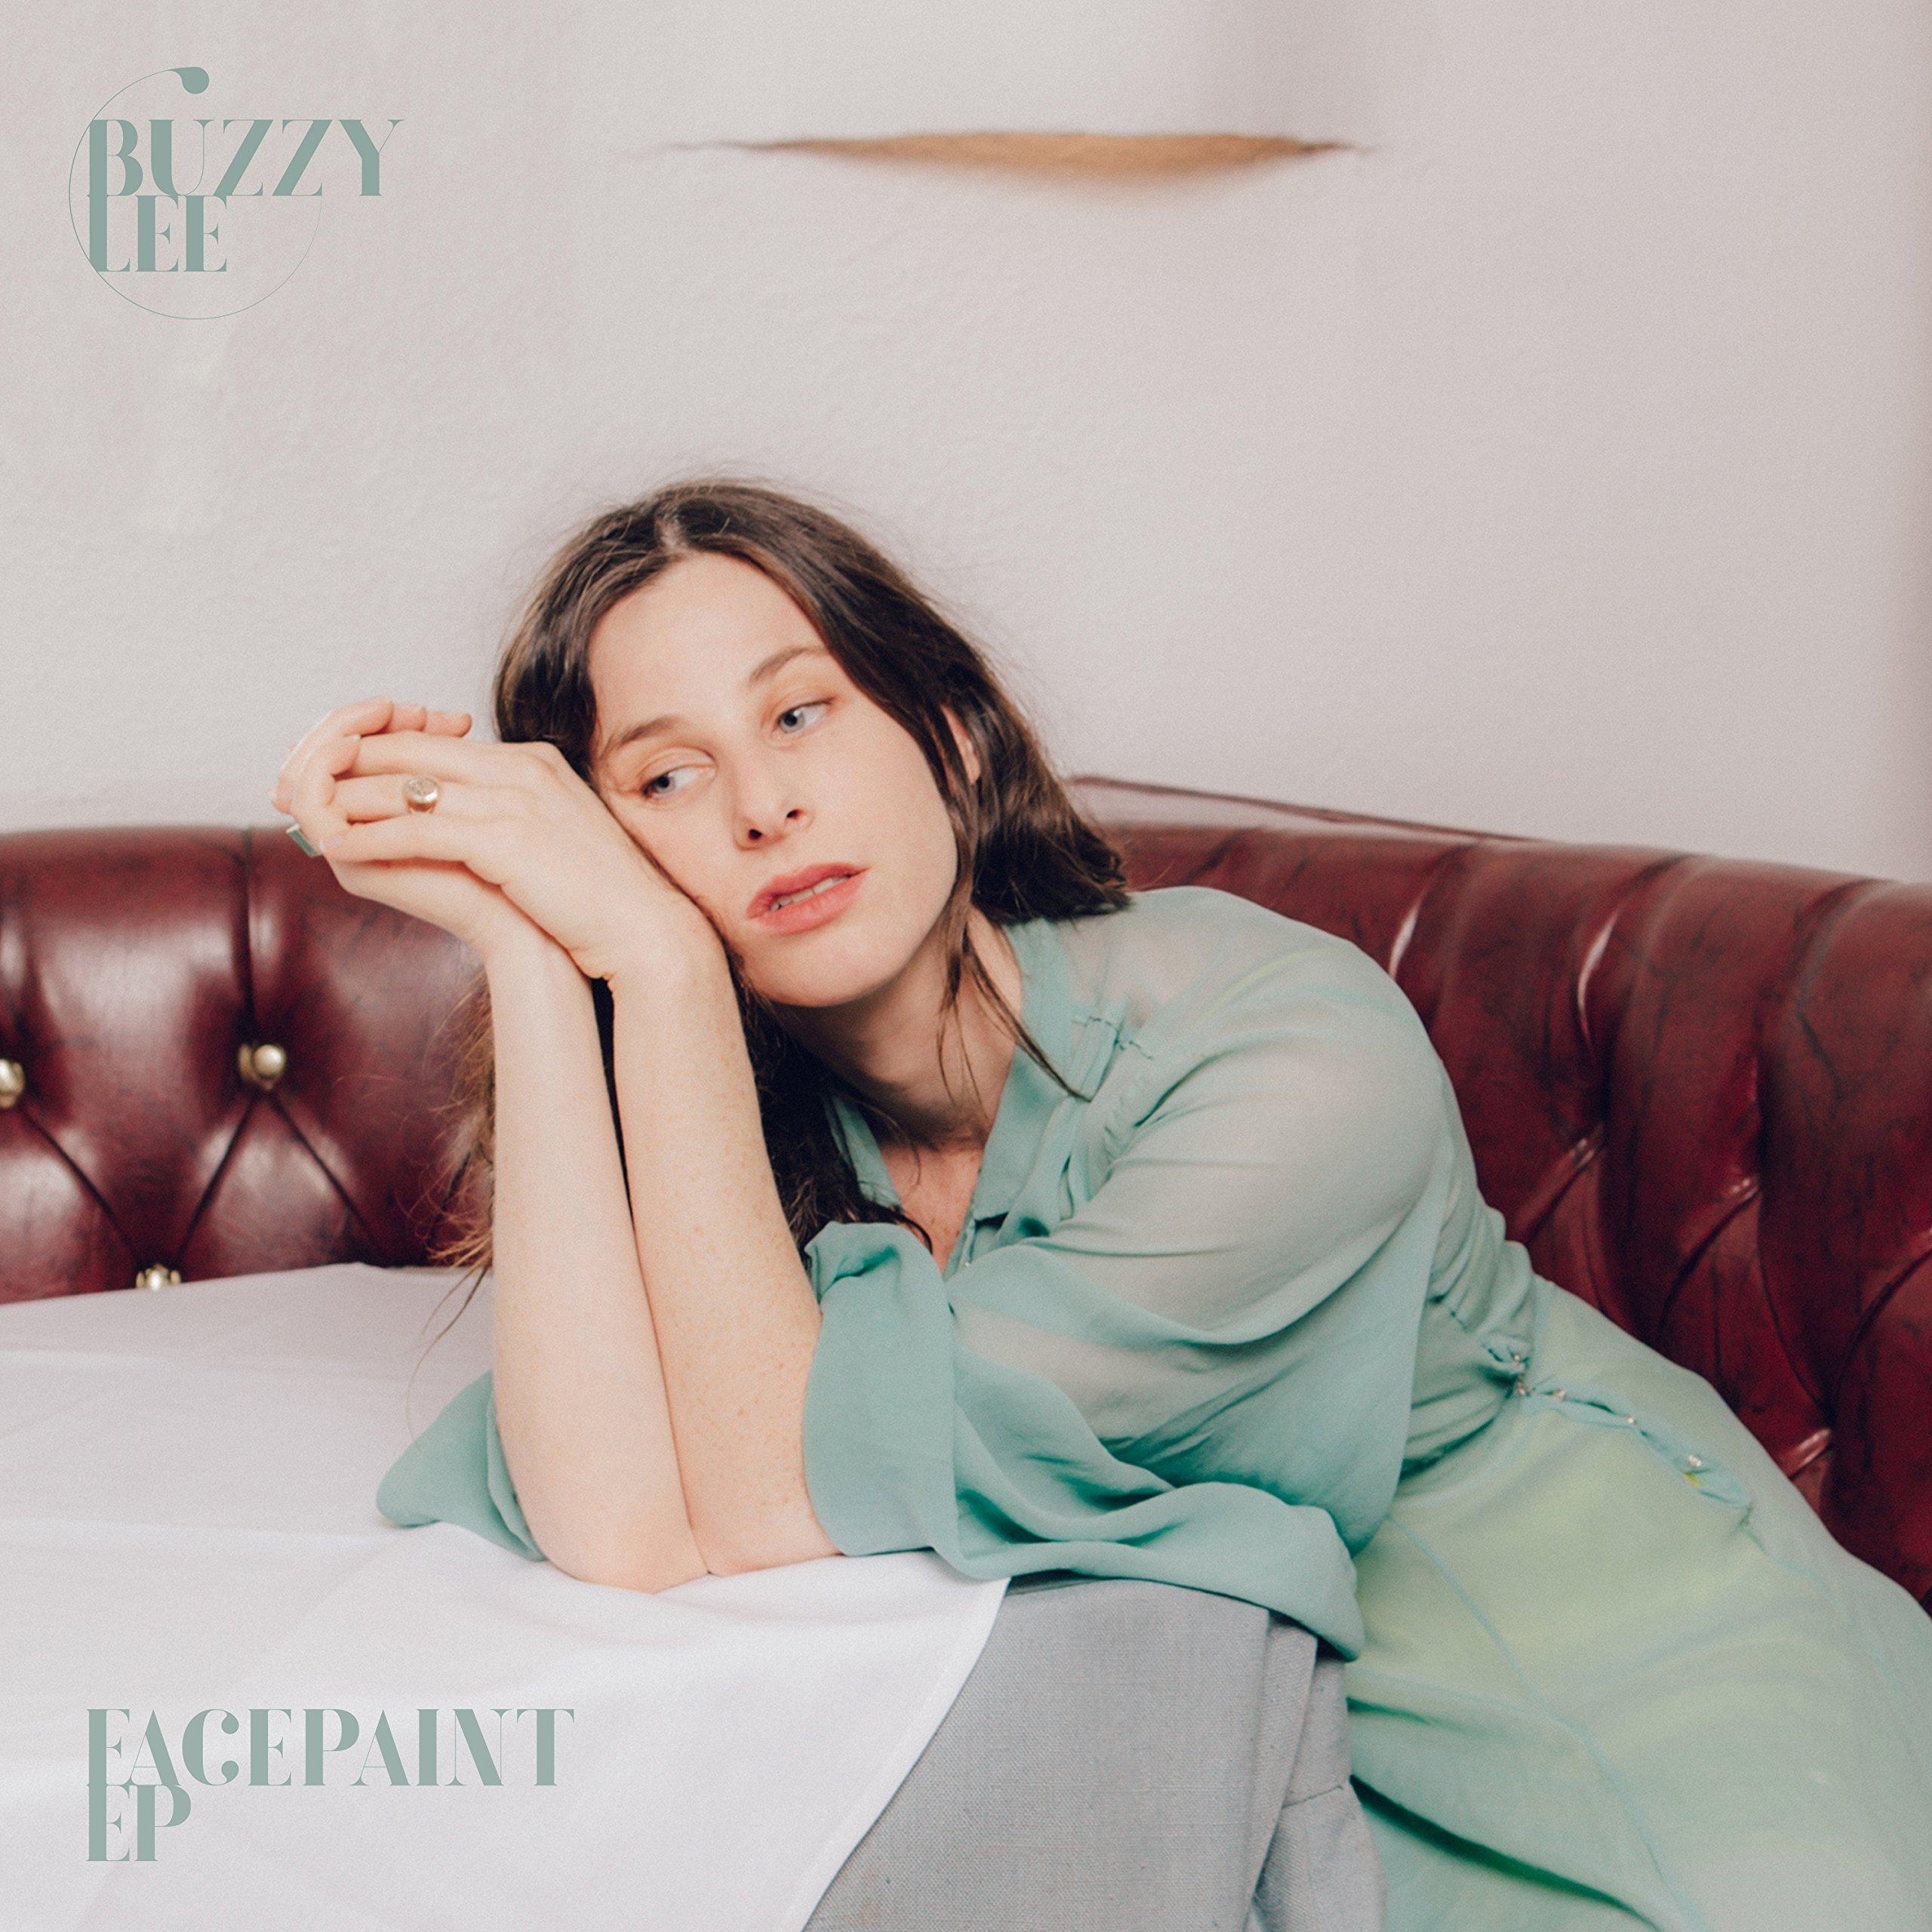 Vinilo : Buzzy Lee - Facepaint [ep] (Extended Play, 180 Gram Vinyl)